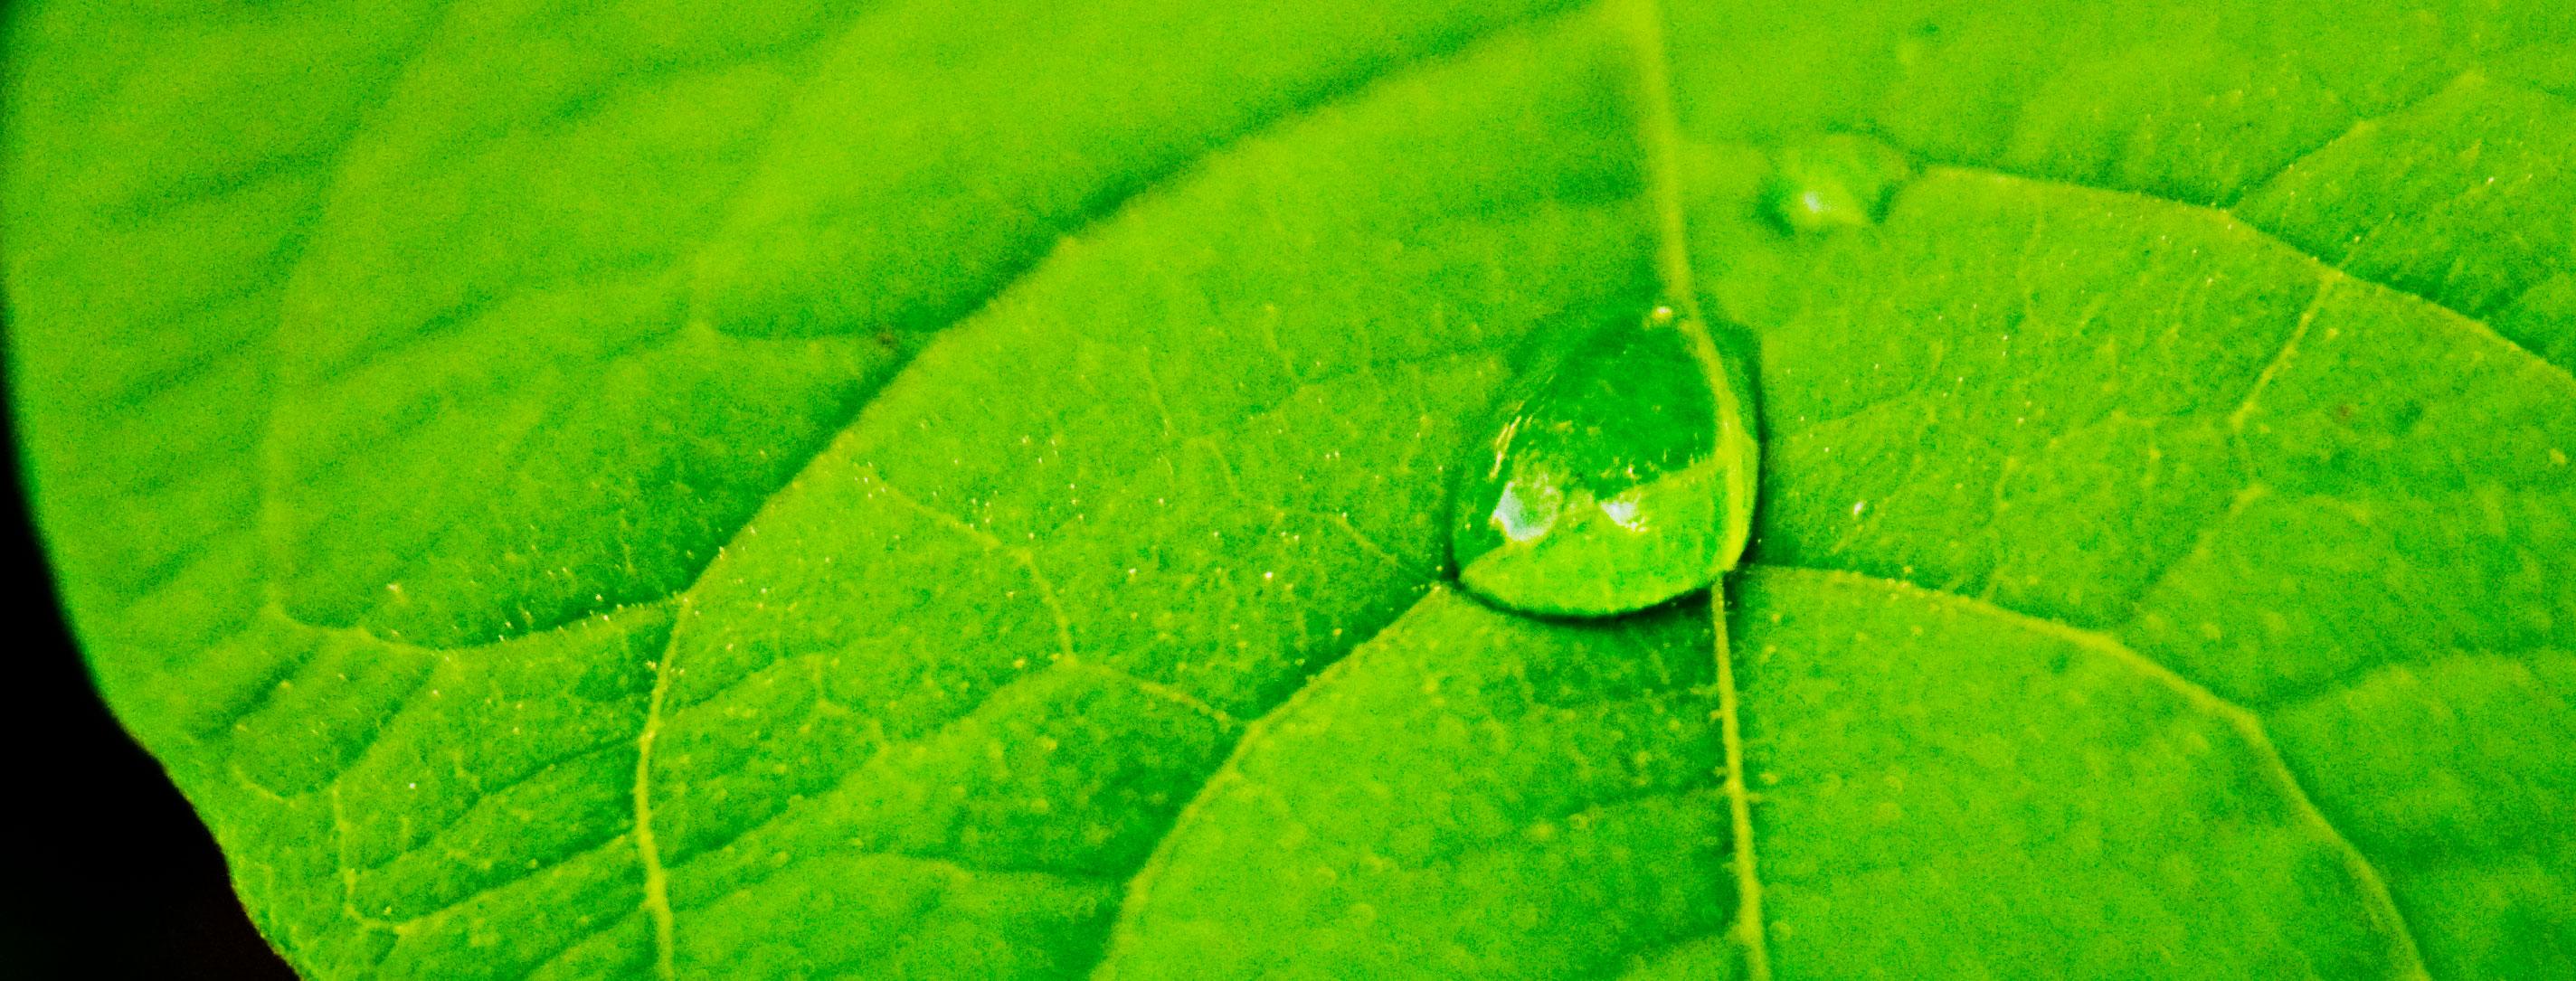 green benefits eco friendly